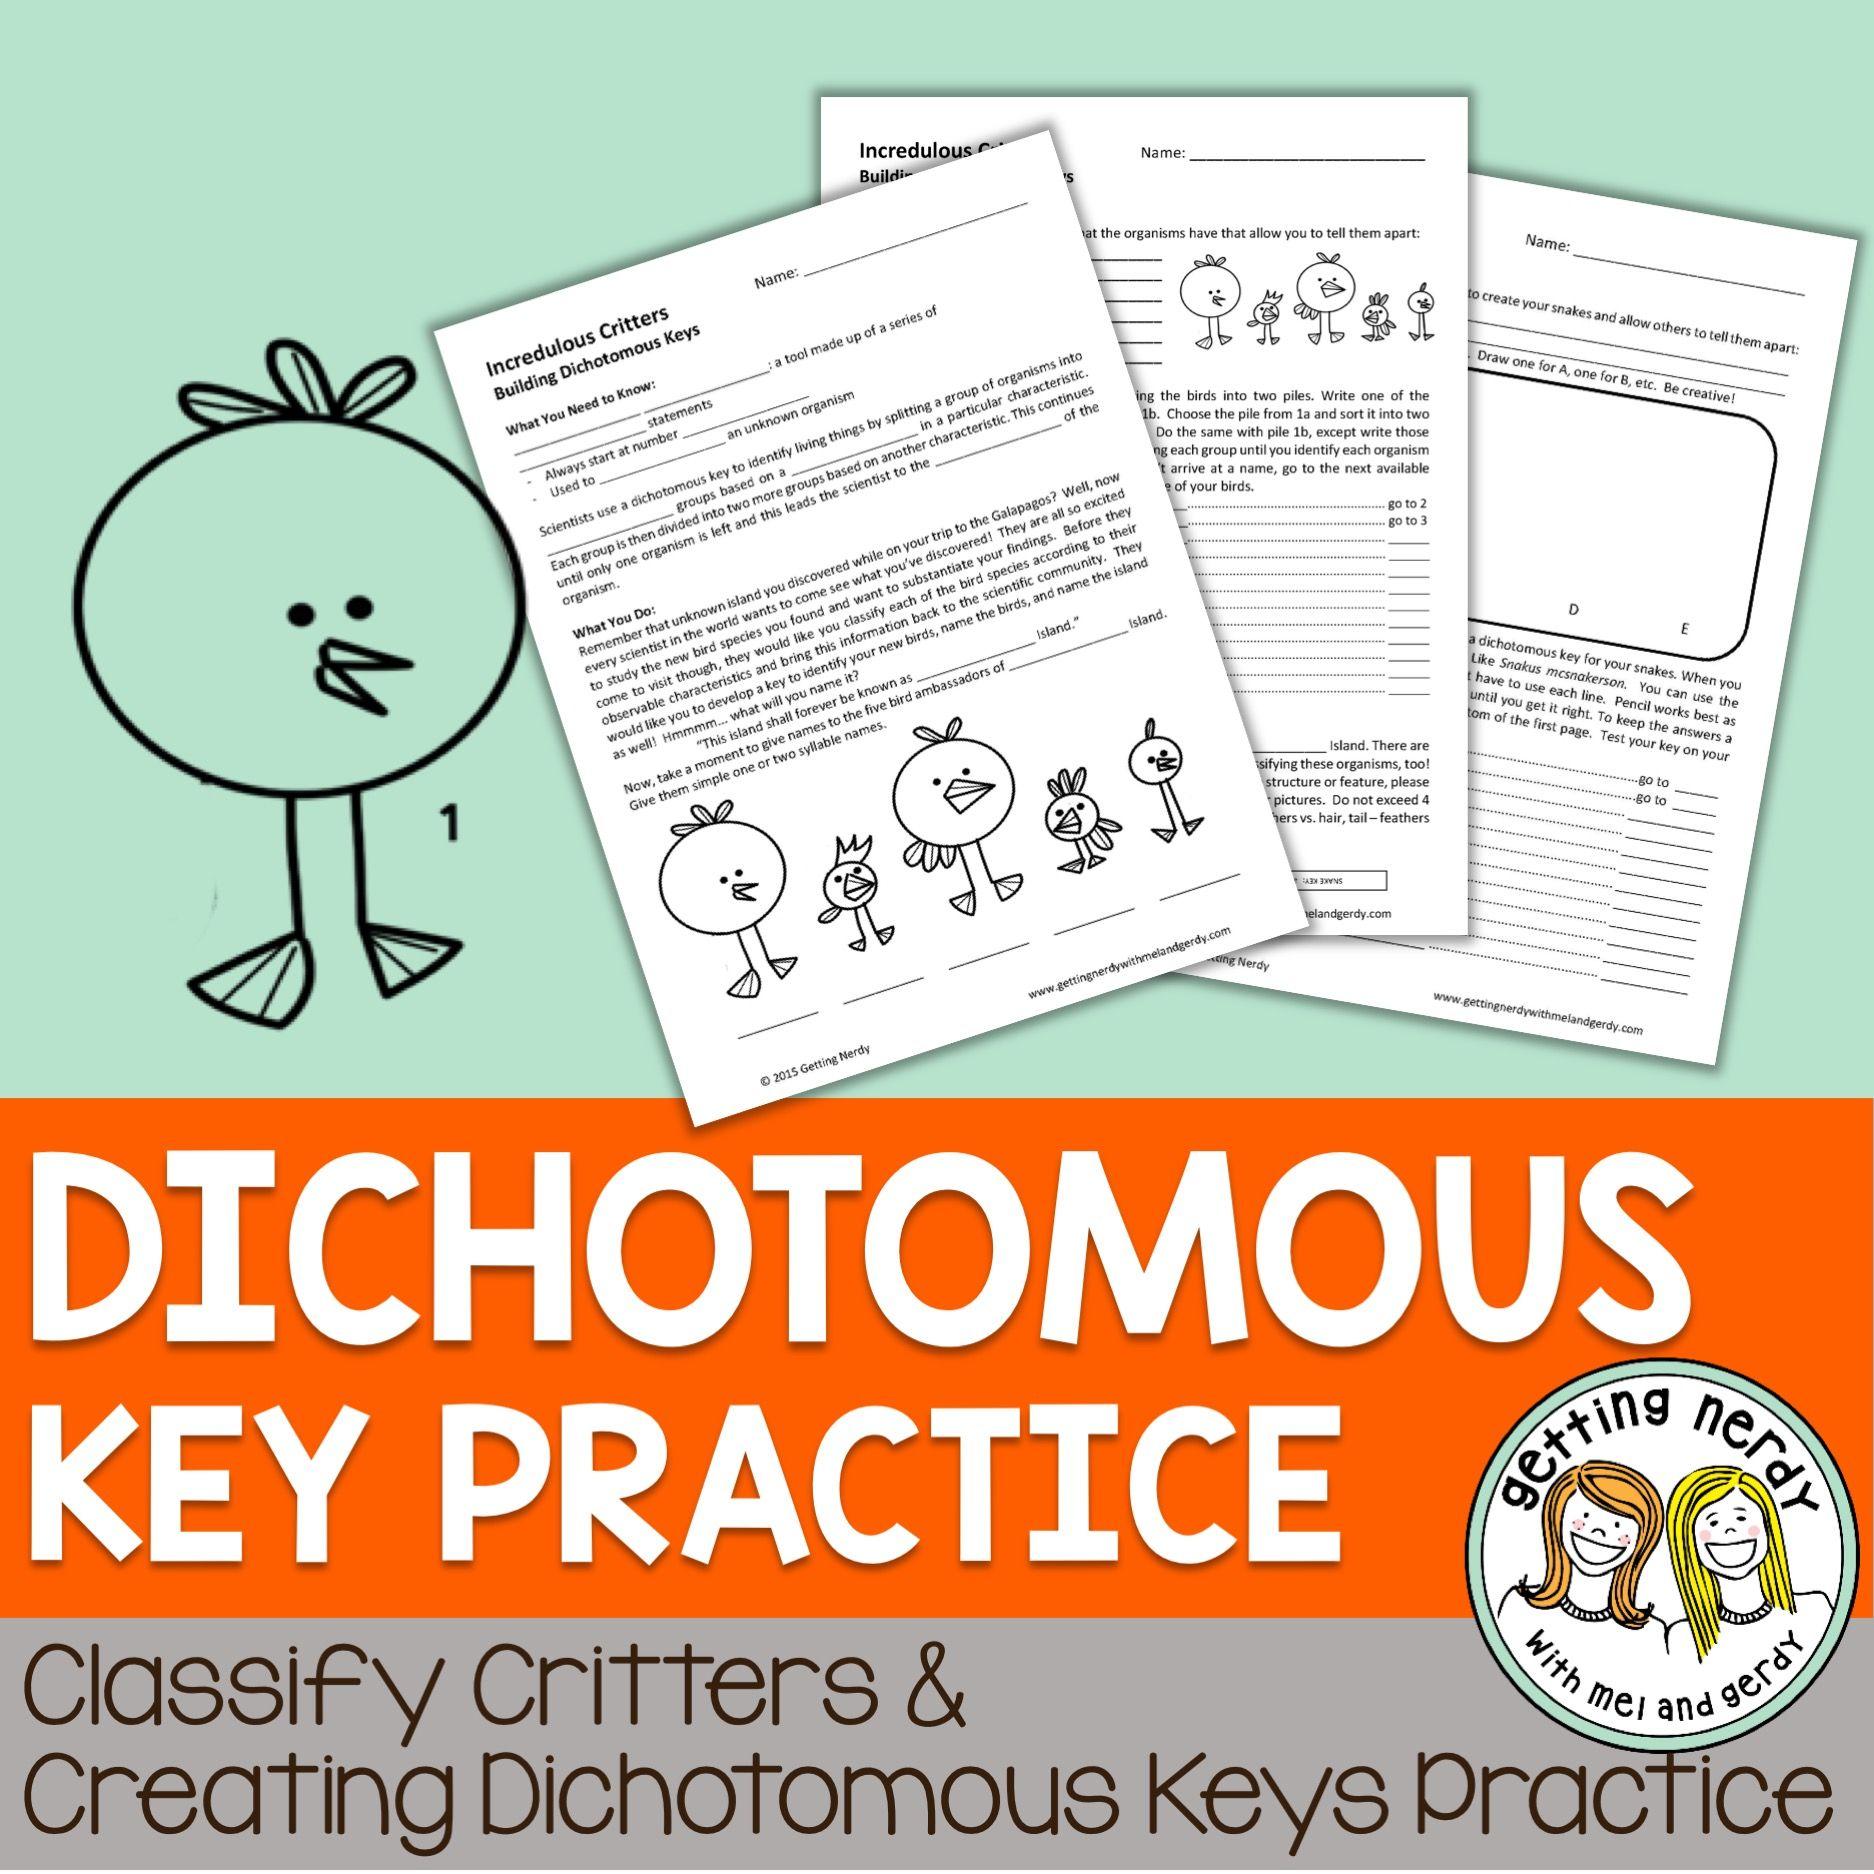 Dichotomous Key Practice